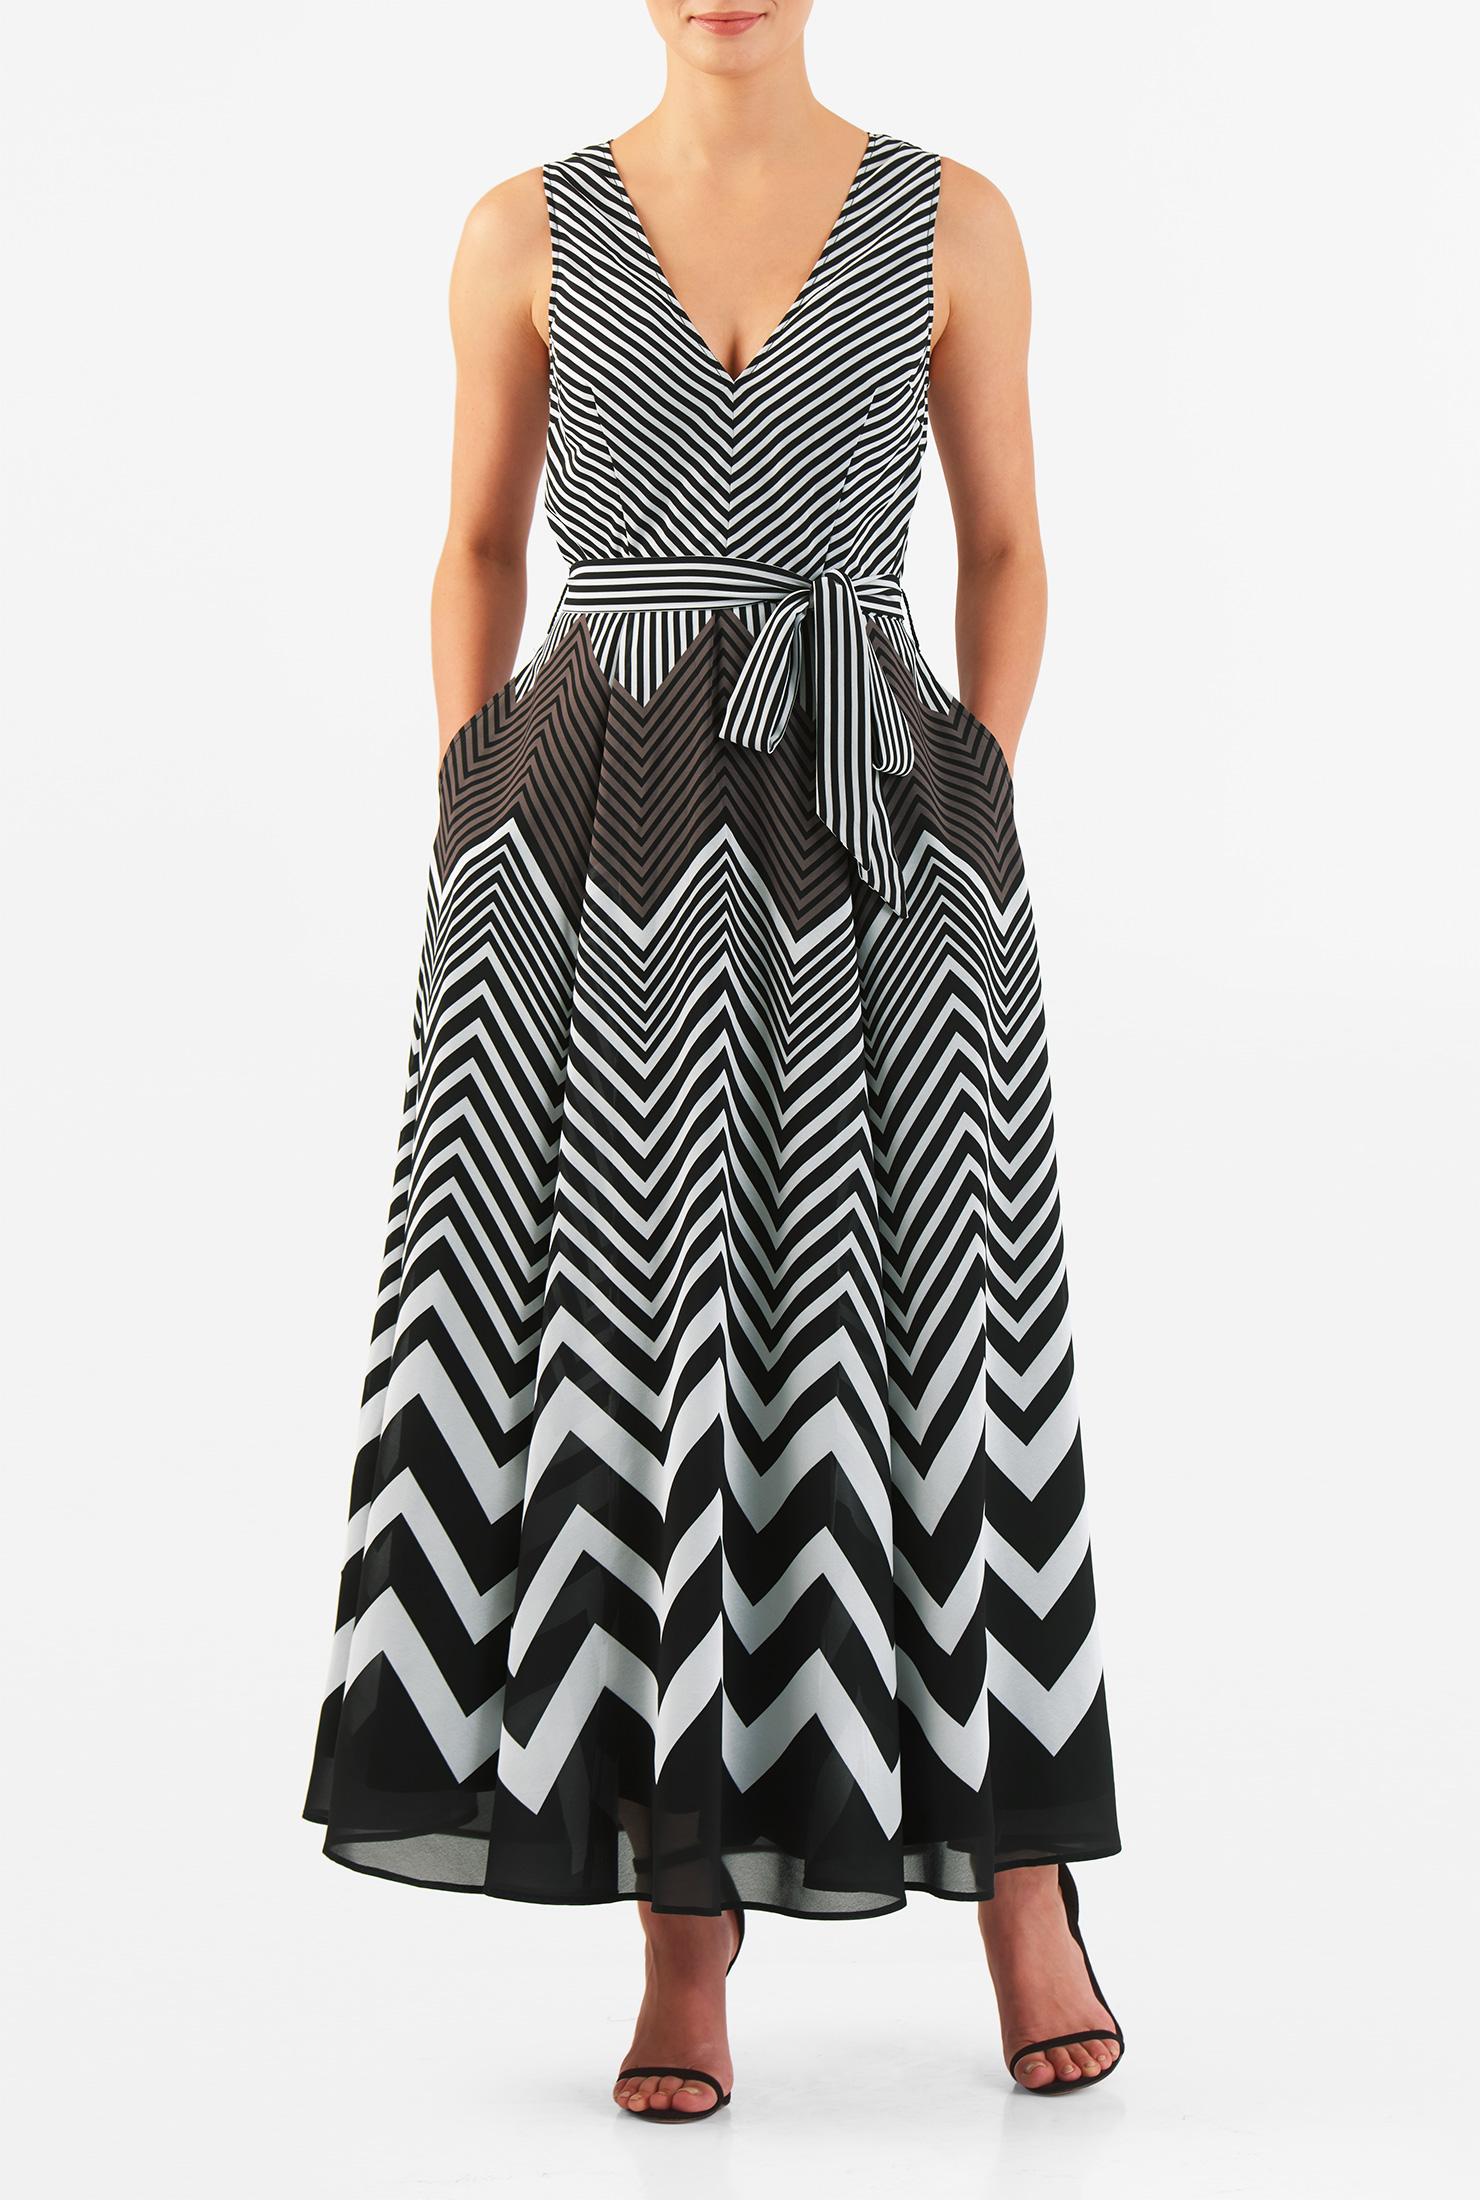 Chevron Ankle Length Dress